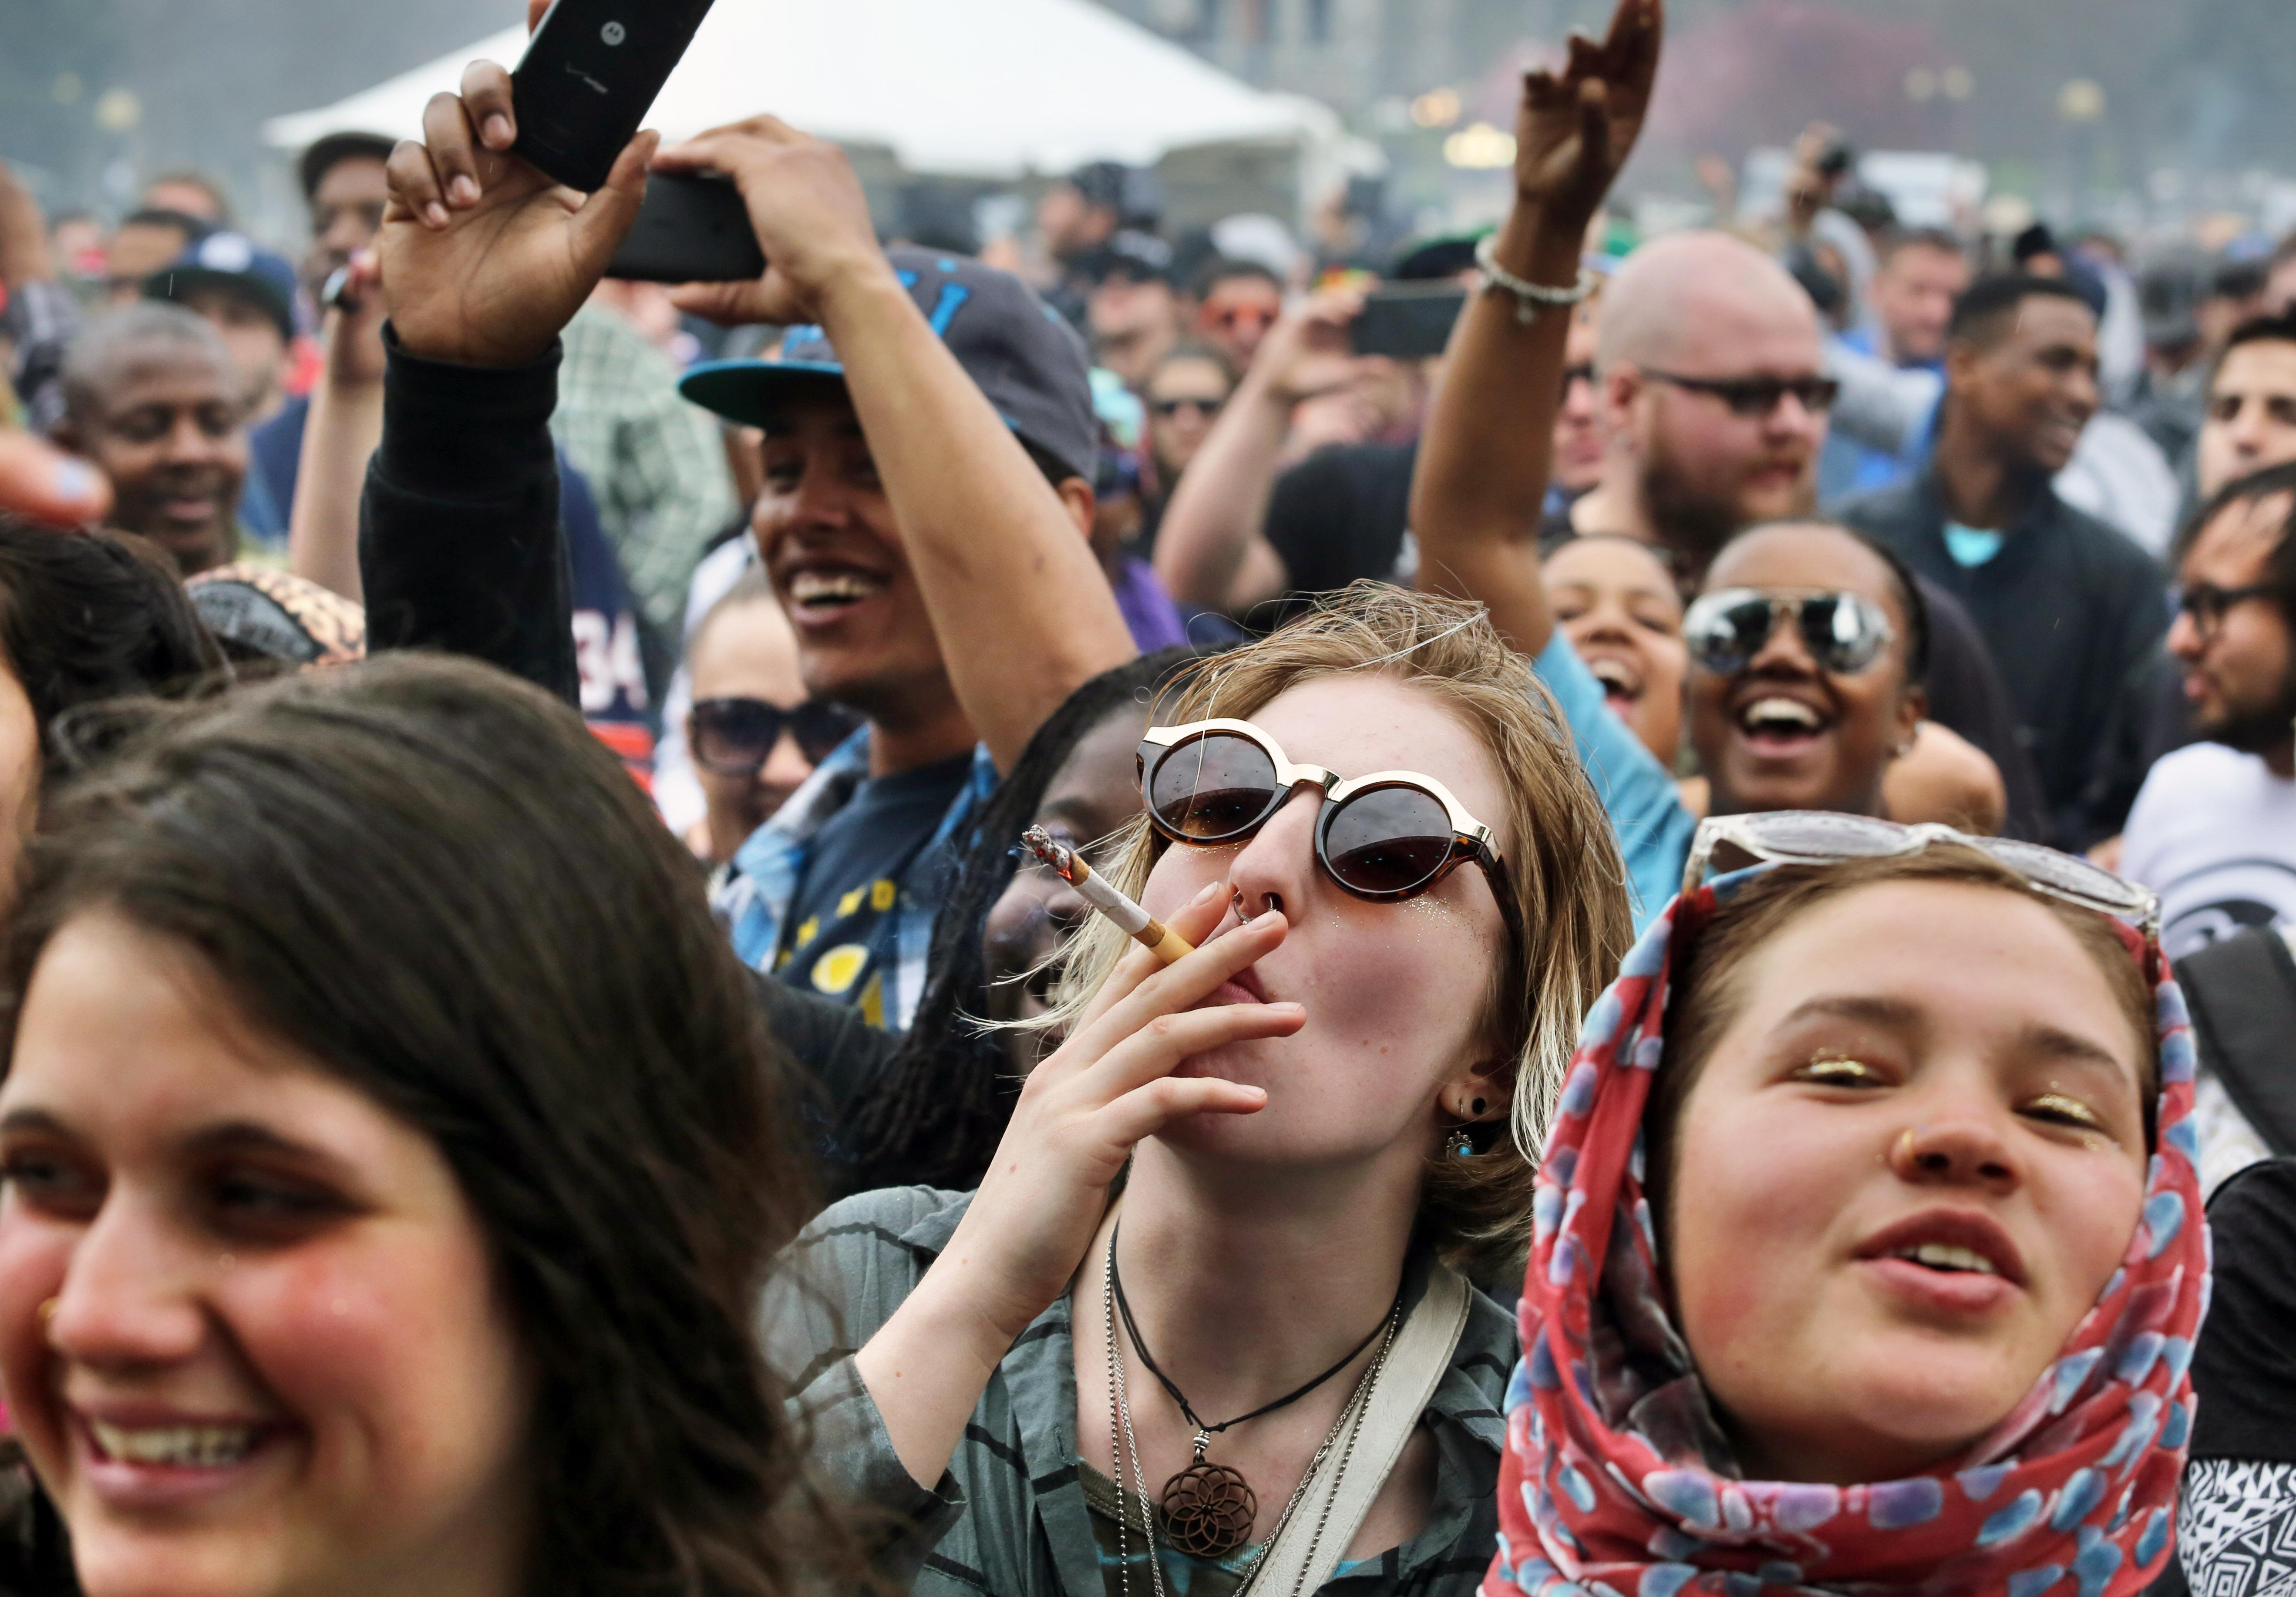 Photo: Smoking marijuana in public (AP Photo)